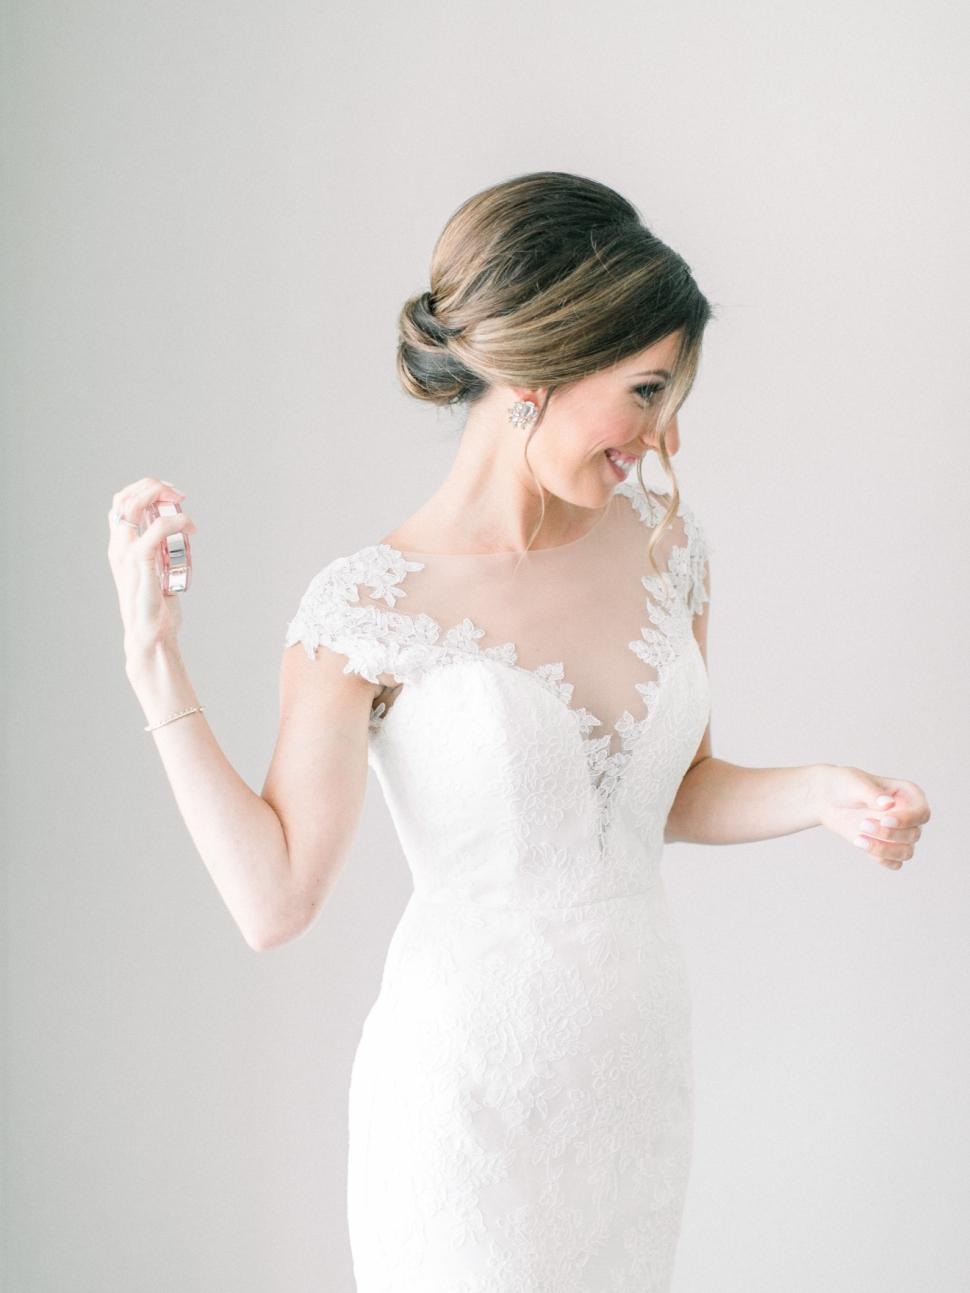 Connecticut-Wedding-Photographer-Cassi-Claire-Shorehaven-Golf-Club-Wedding_10.jpg